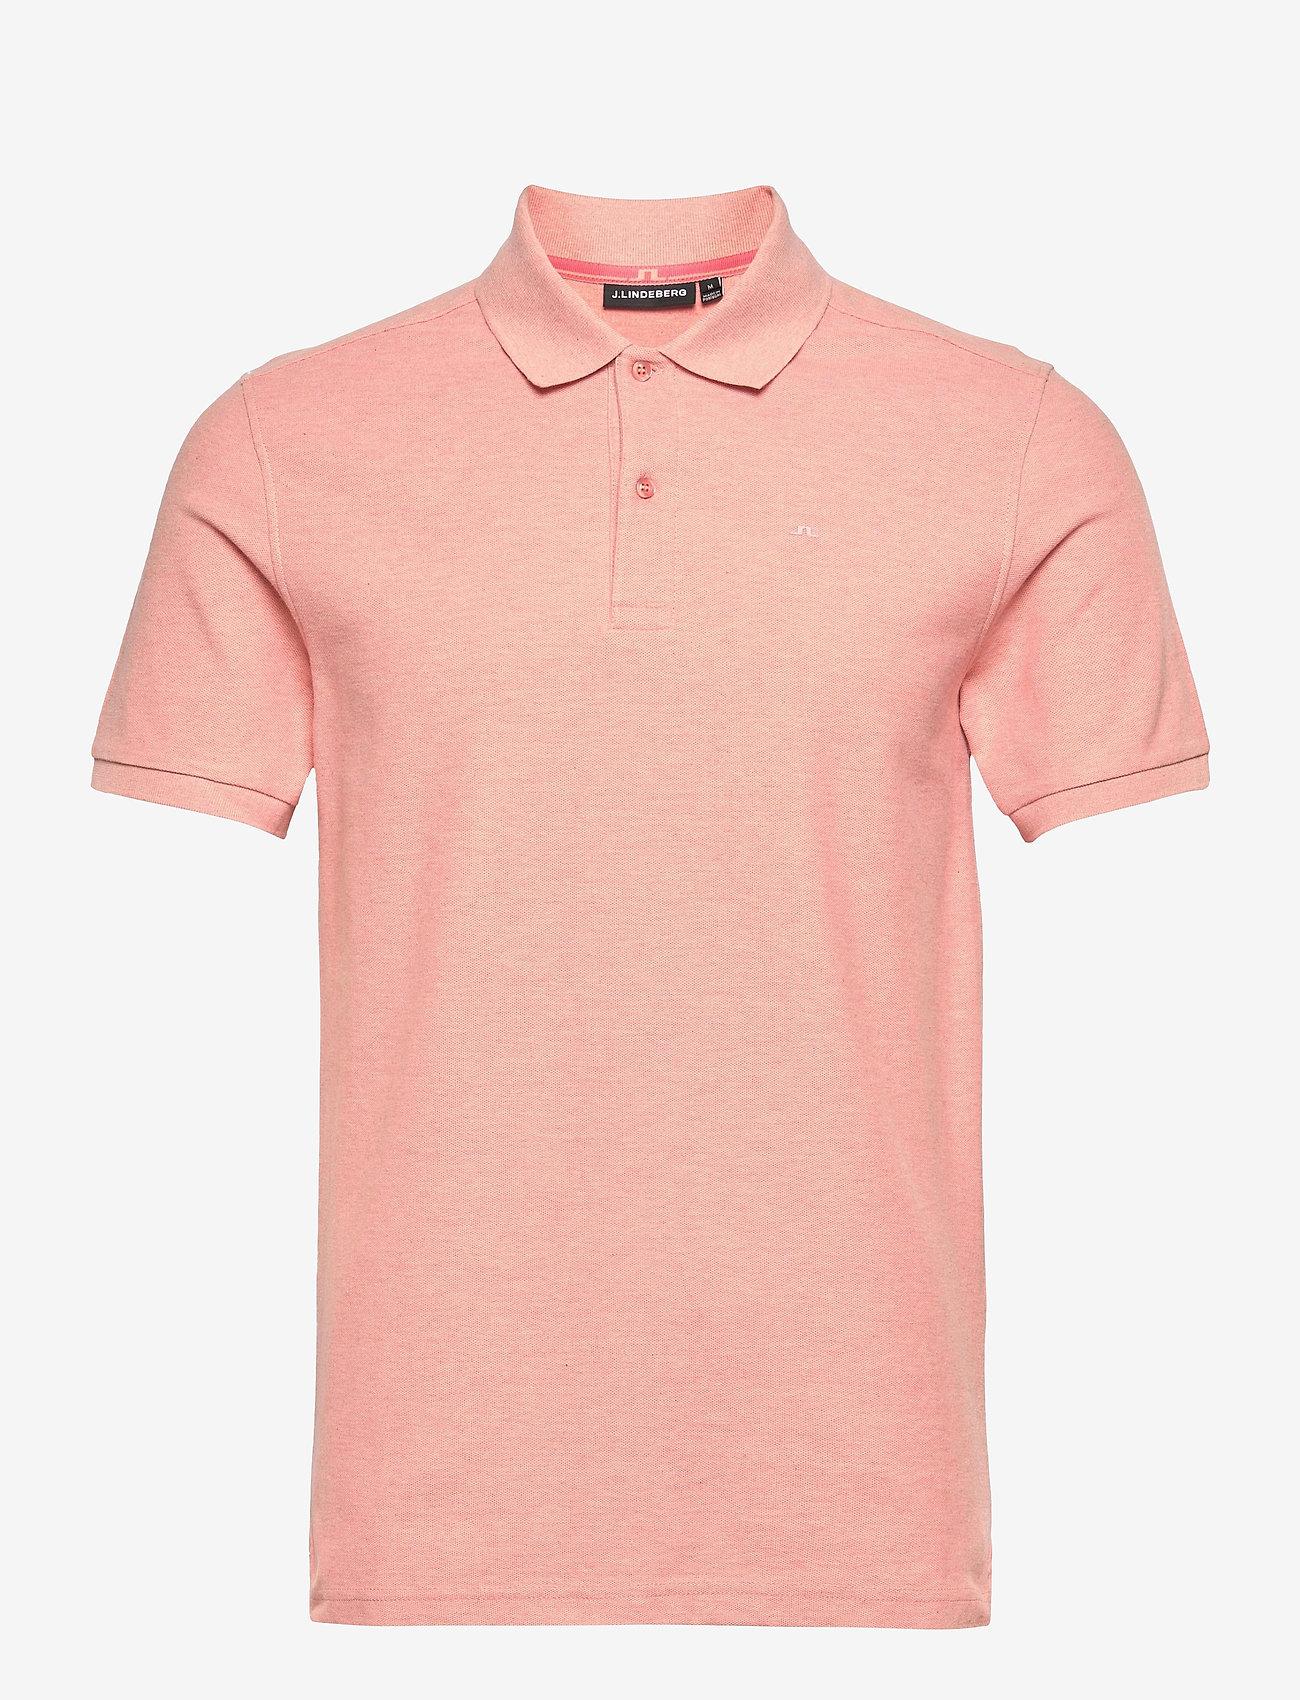 J. Lindeberg - Troy Polo Shirt Seasonal Pique - kurzärmelig - rose melange - 0